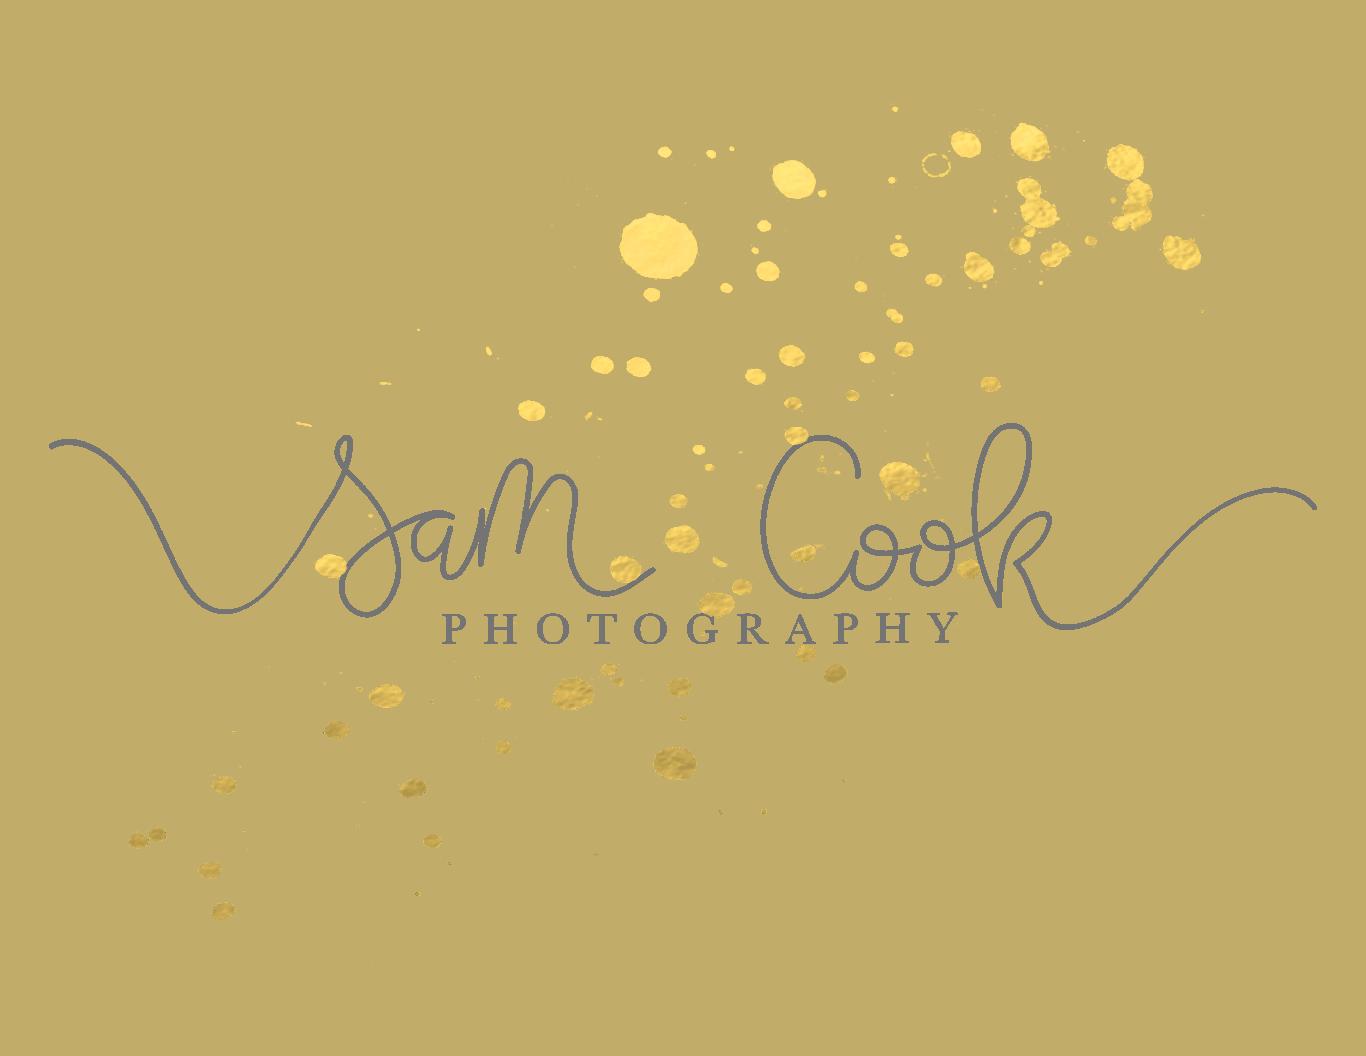 Sam Cook Photography